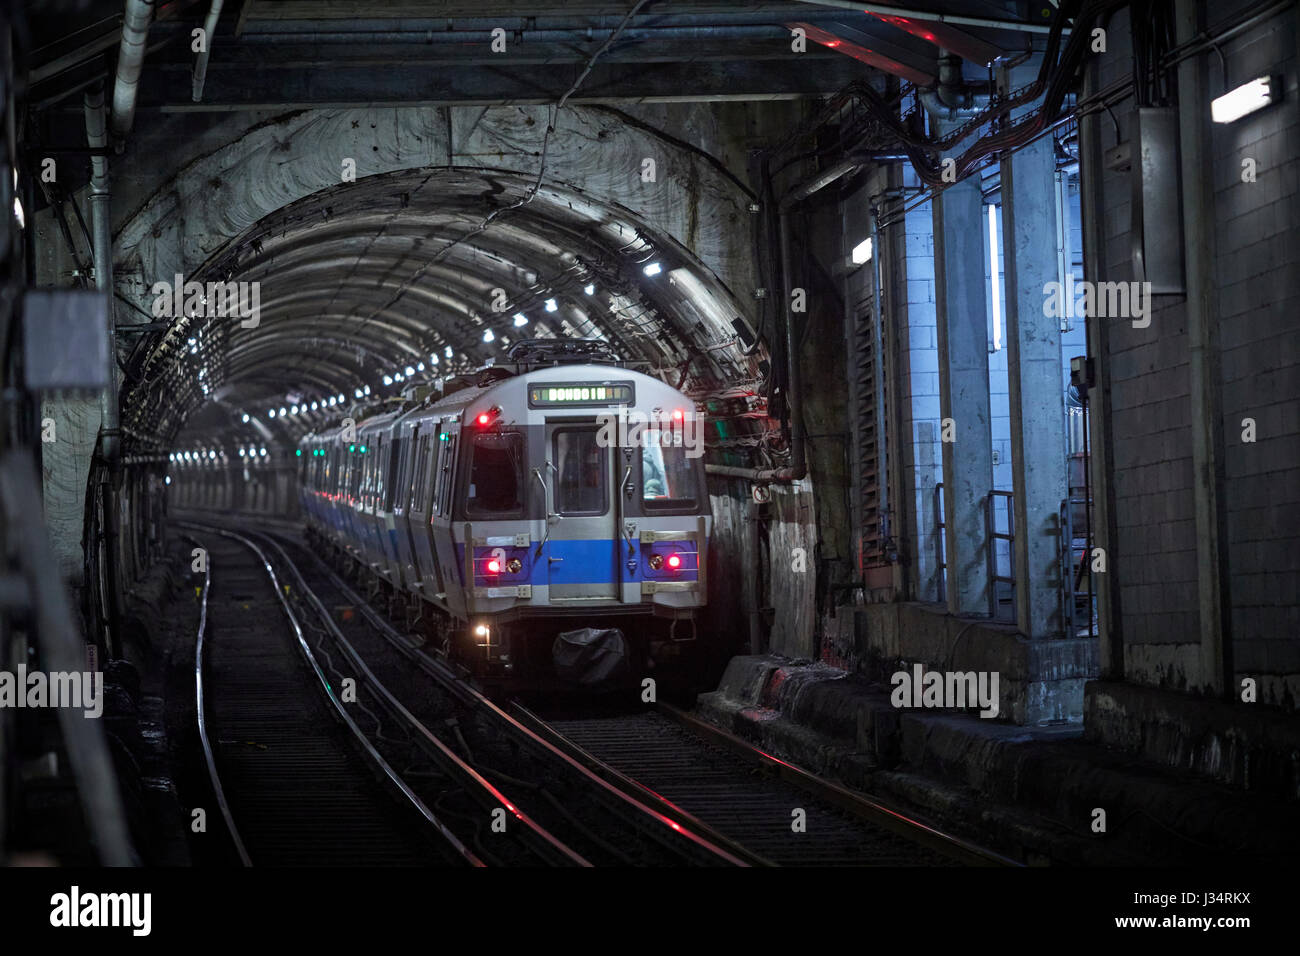 Massachusetts Bay Transportation Authority (MBTA) Blue Line